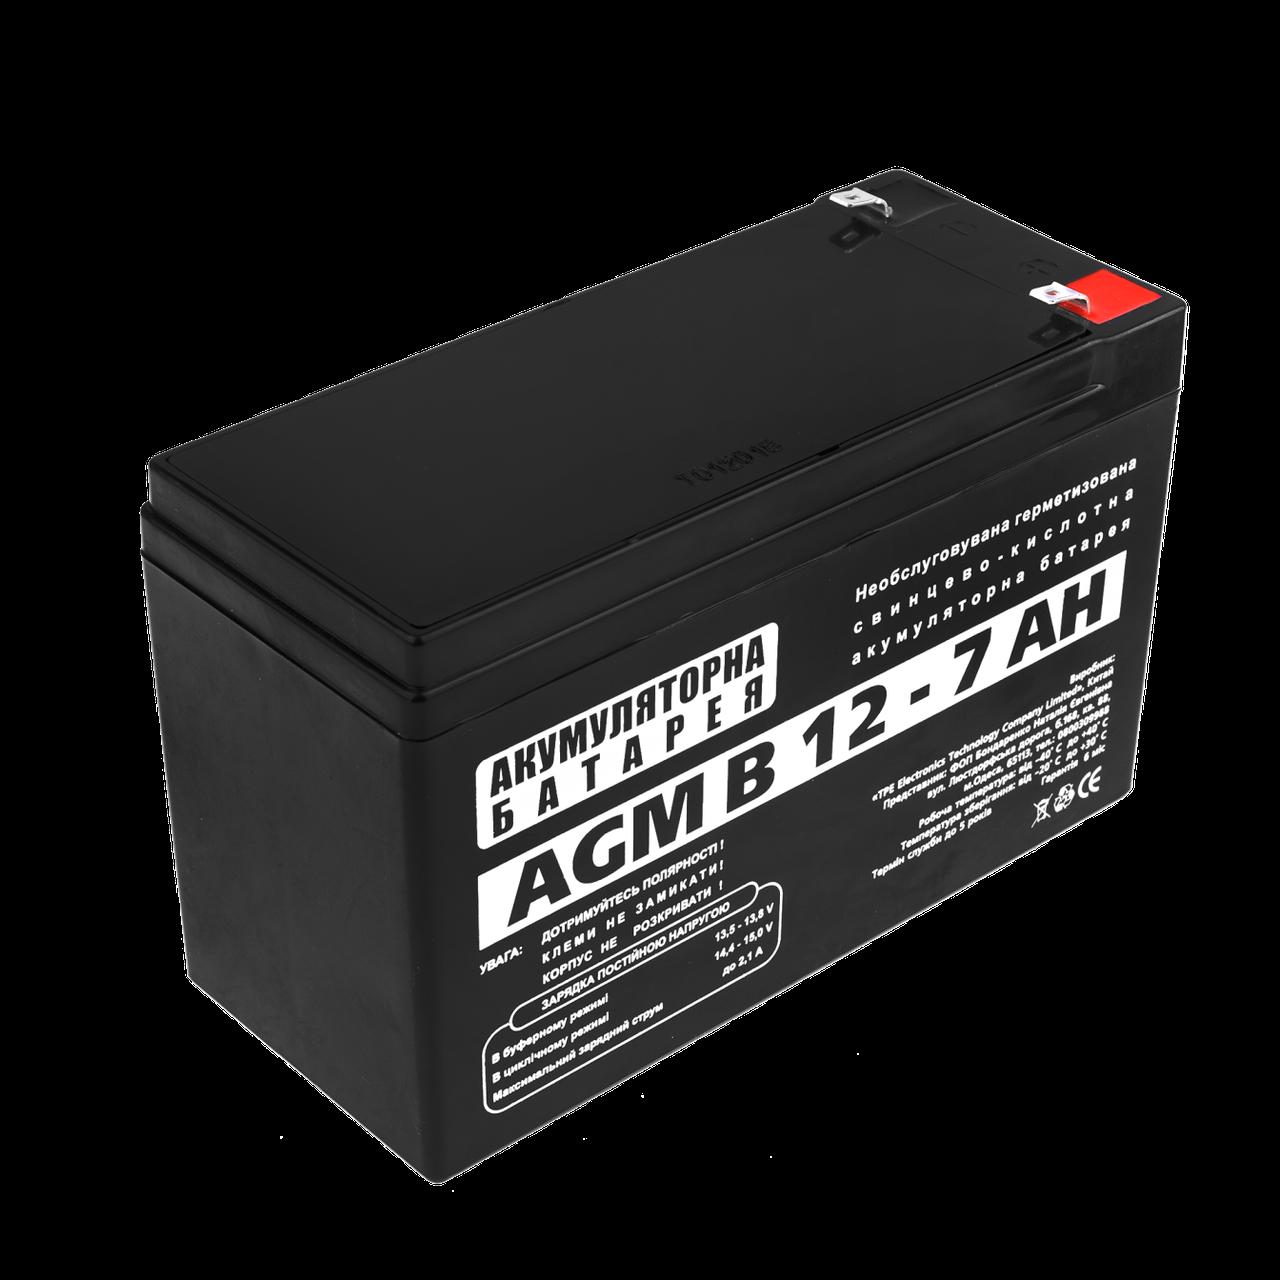 AGM Аккумулятор LogicPower В12-7 (12 Вольт, 7 Ач).